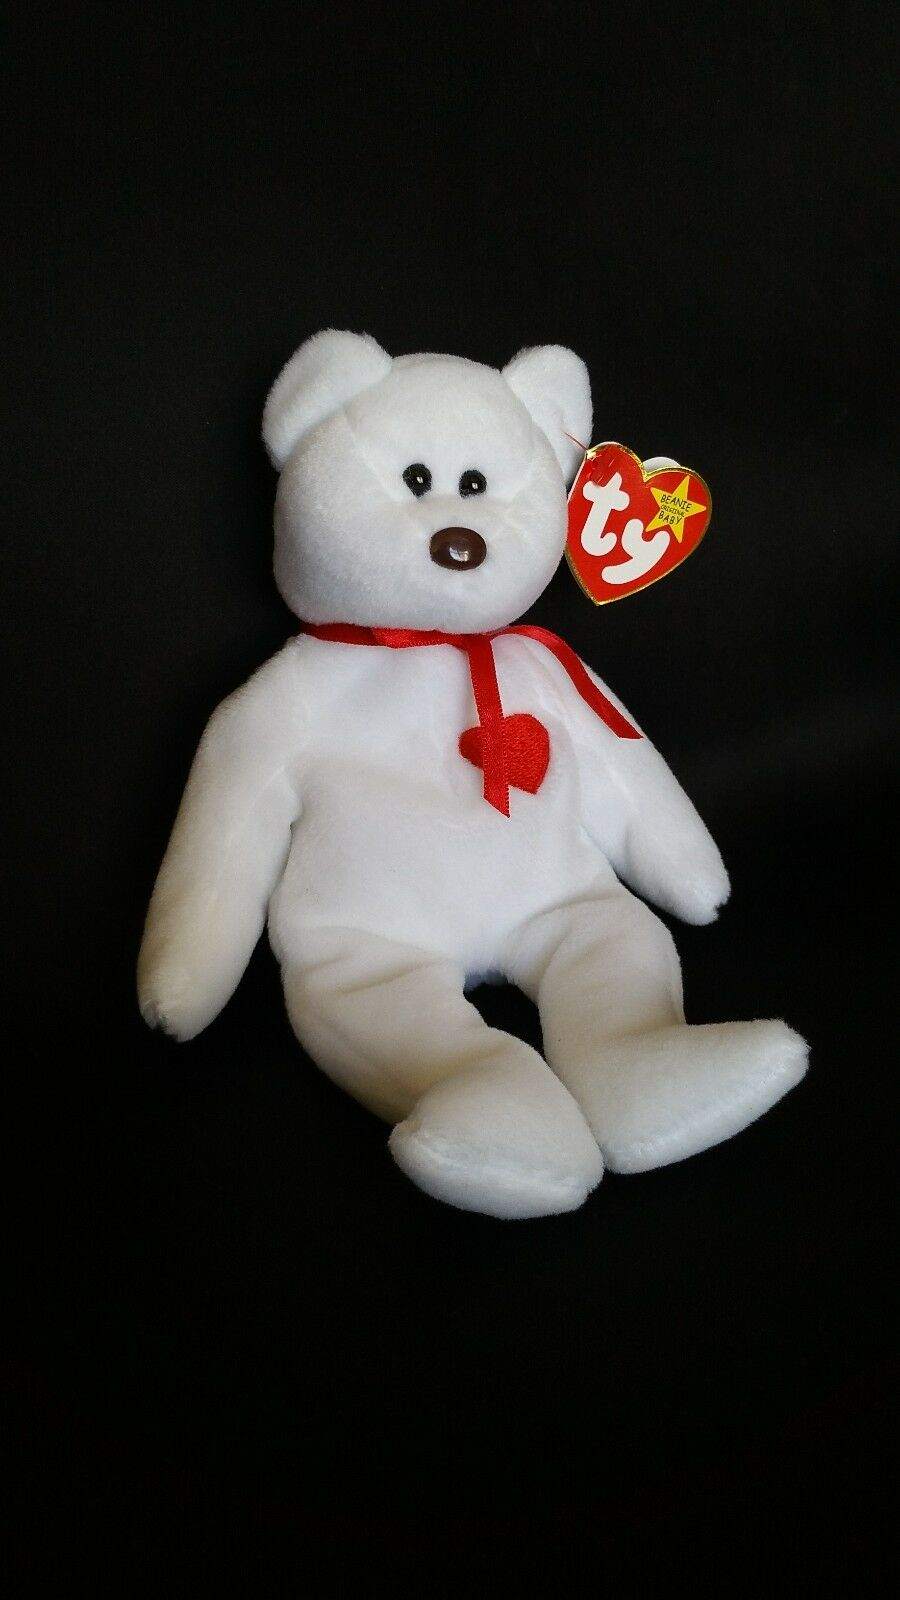 Ty beanie baby valentino - mwmt 5.   6. gen tags origiinal p.v.c.